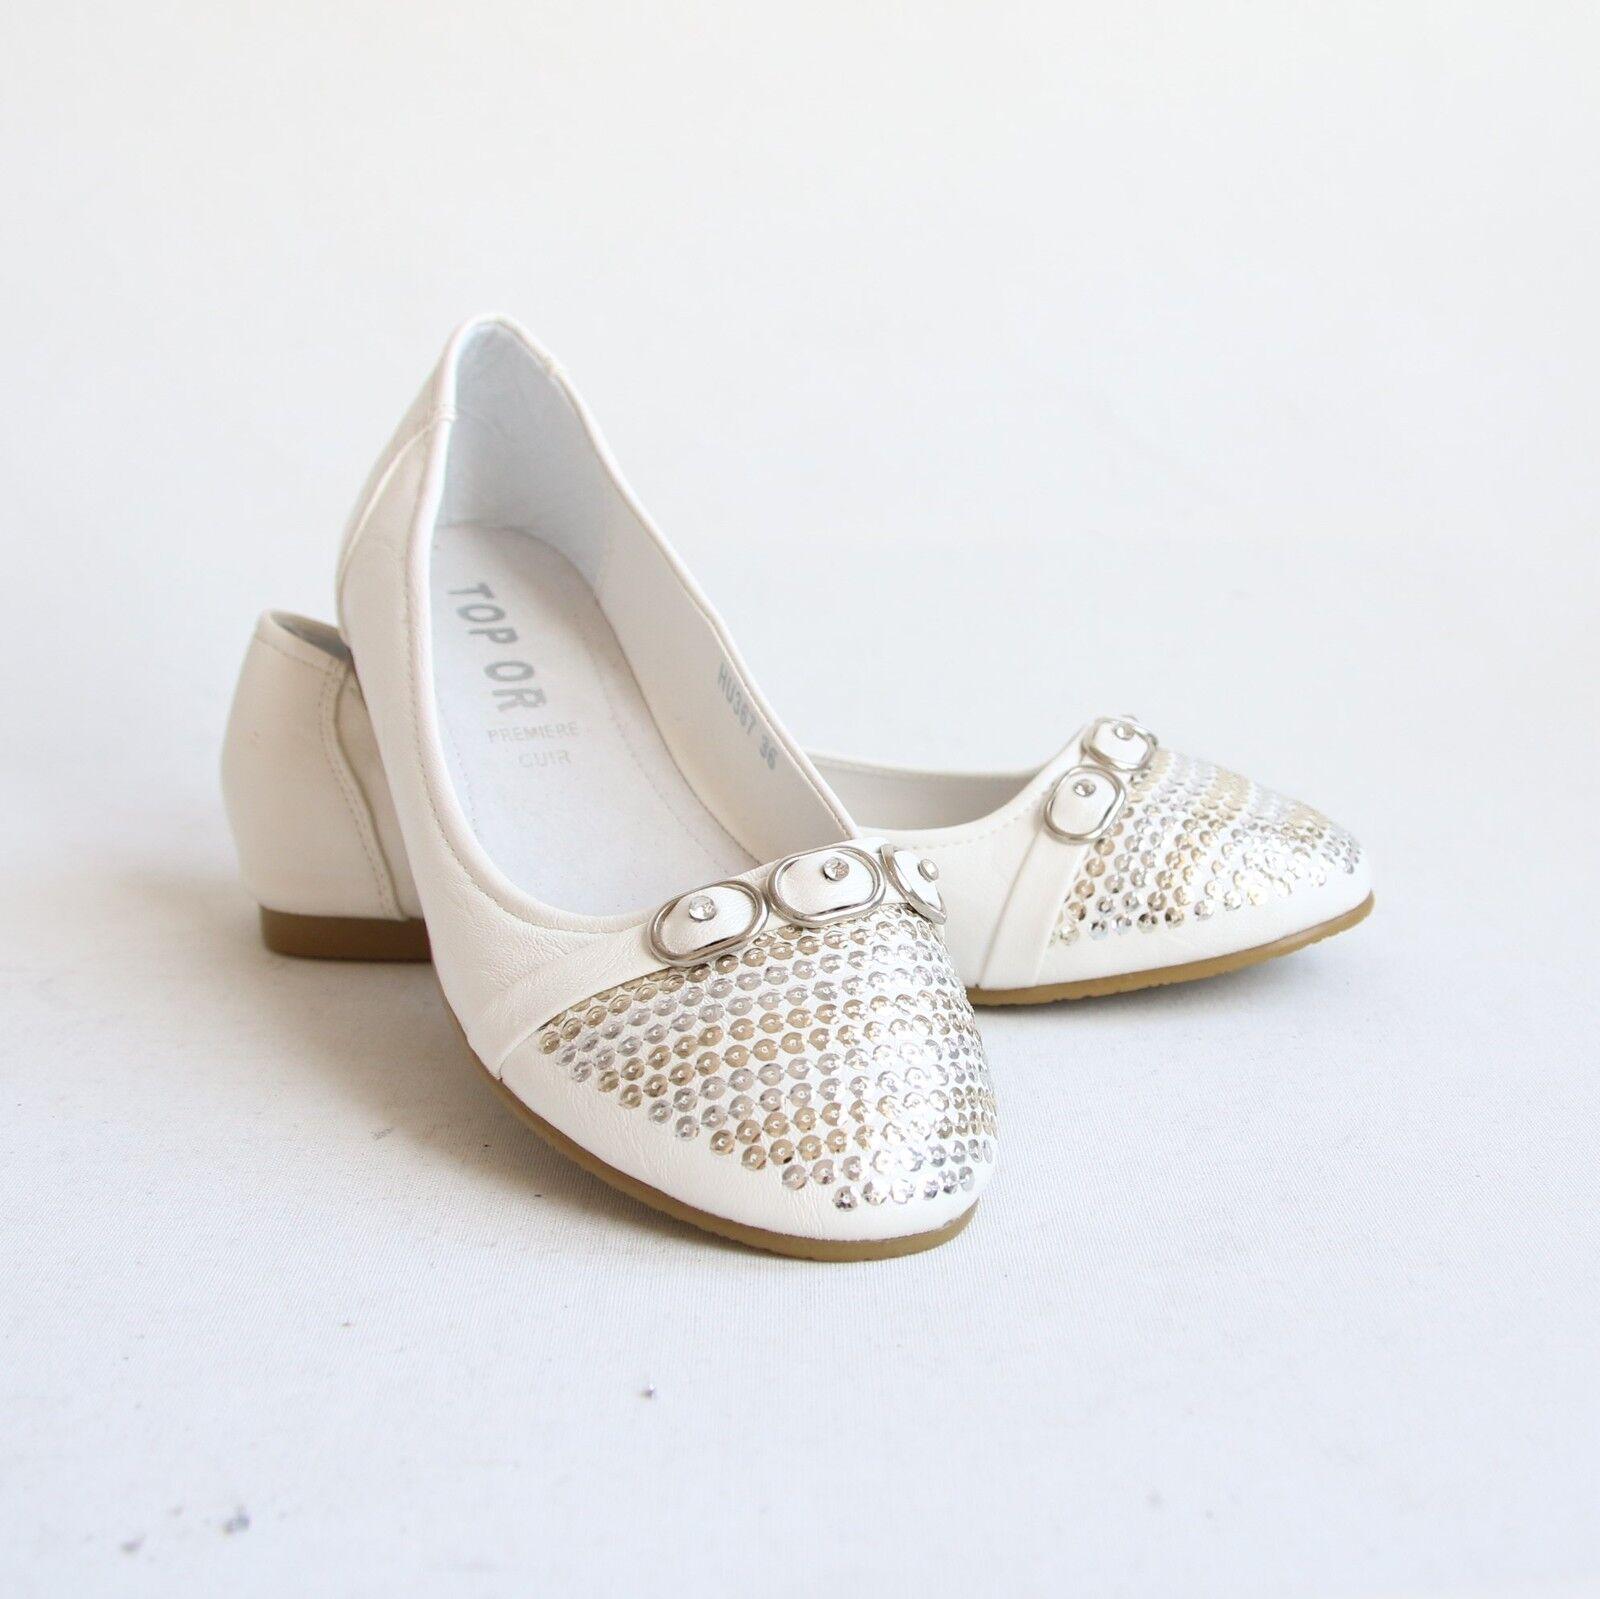 Moda jest prosta i niedroga Ballerinas Weiß 40 Mokassins Slippers Halbschuhe Damenschuhe Schuhe  HU367